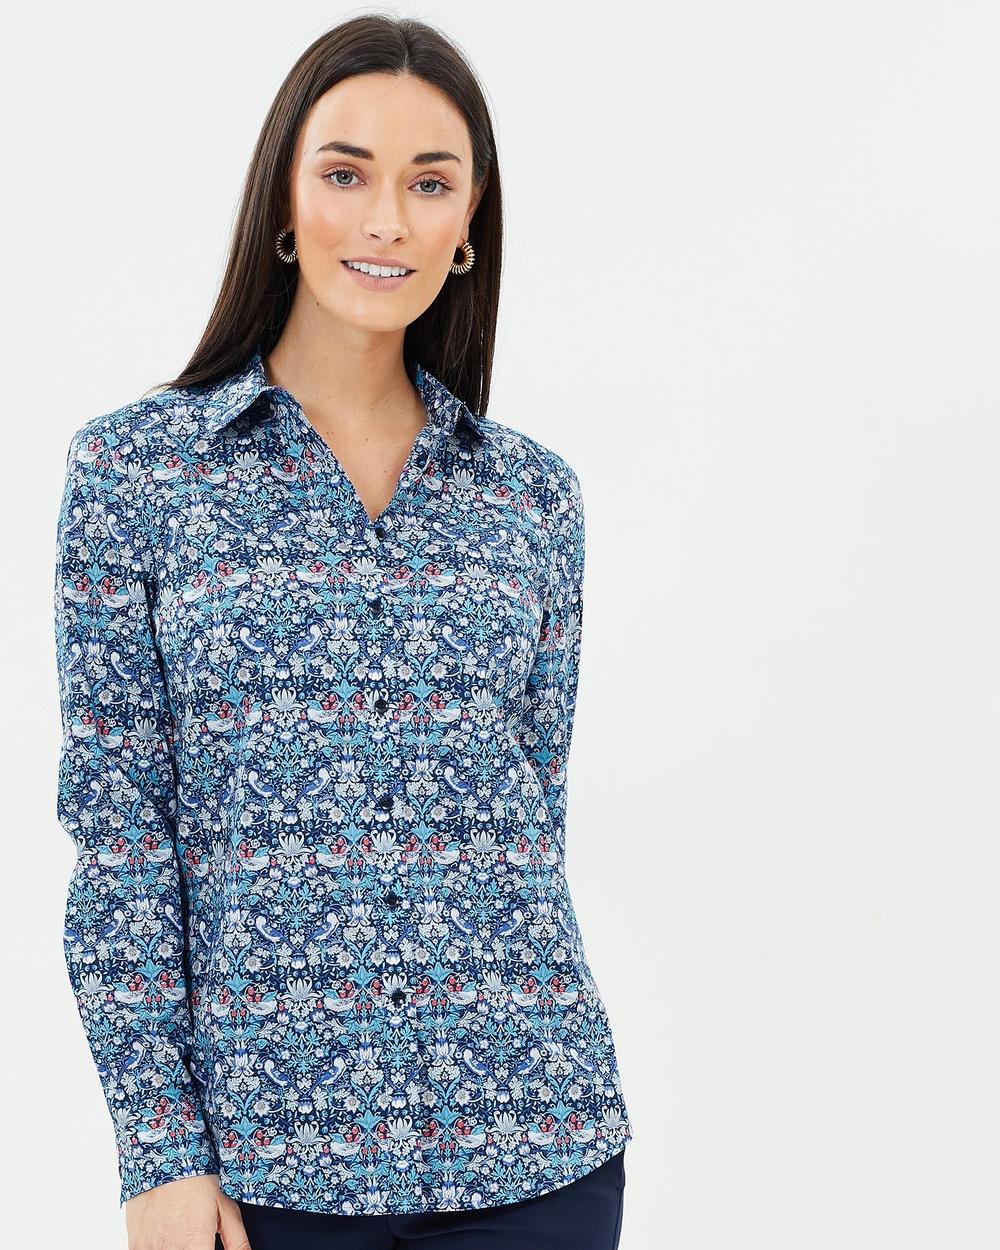 Sportscraft Erica Liberty Shirt Tops Blue Multi Erica Liberty Shirt